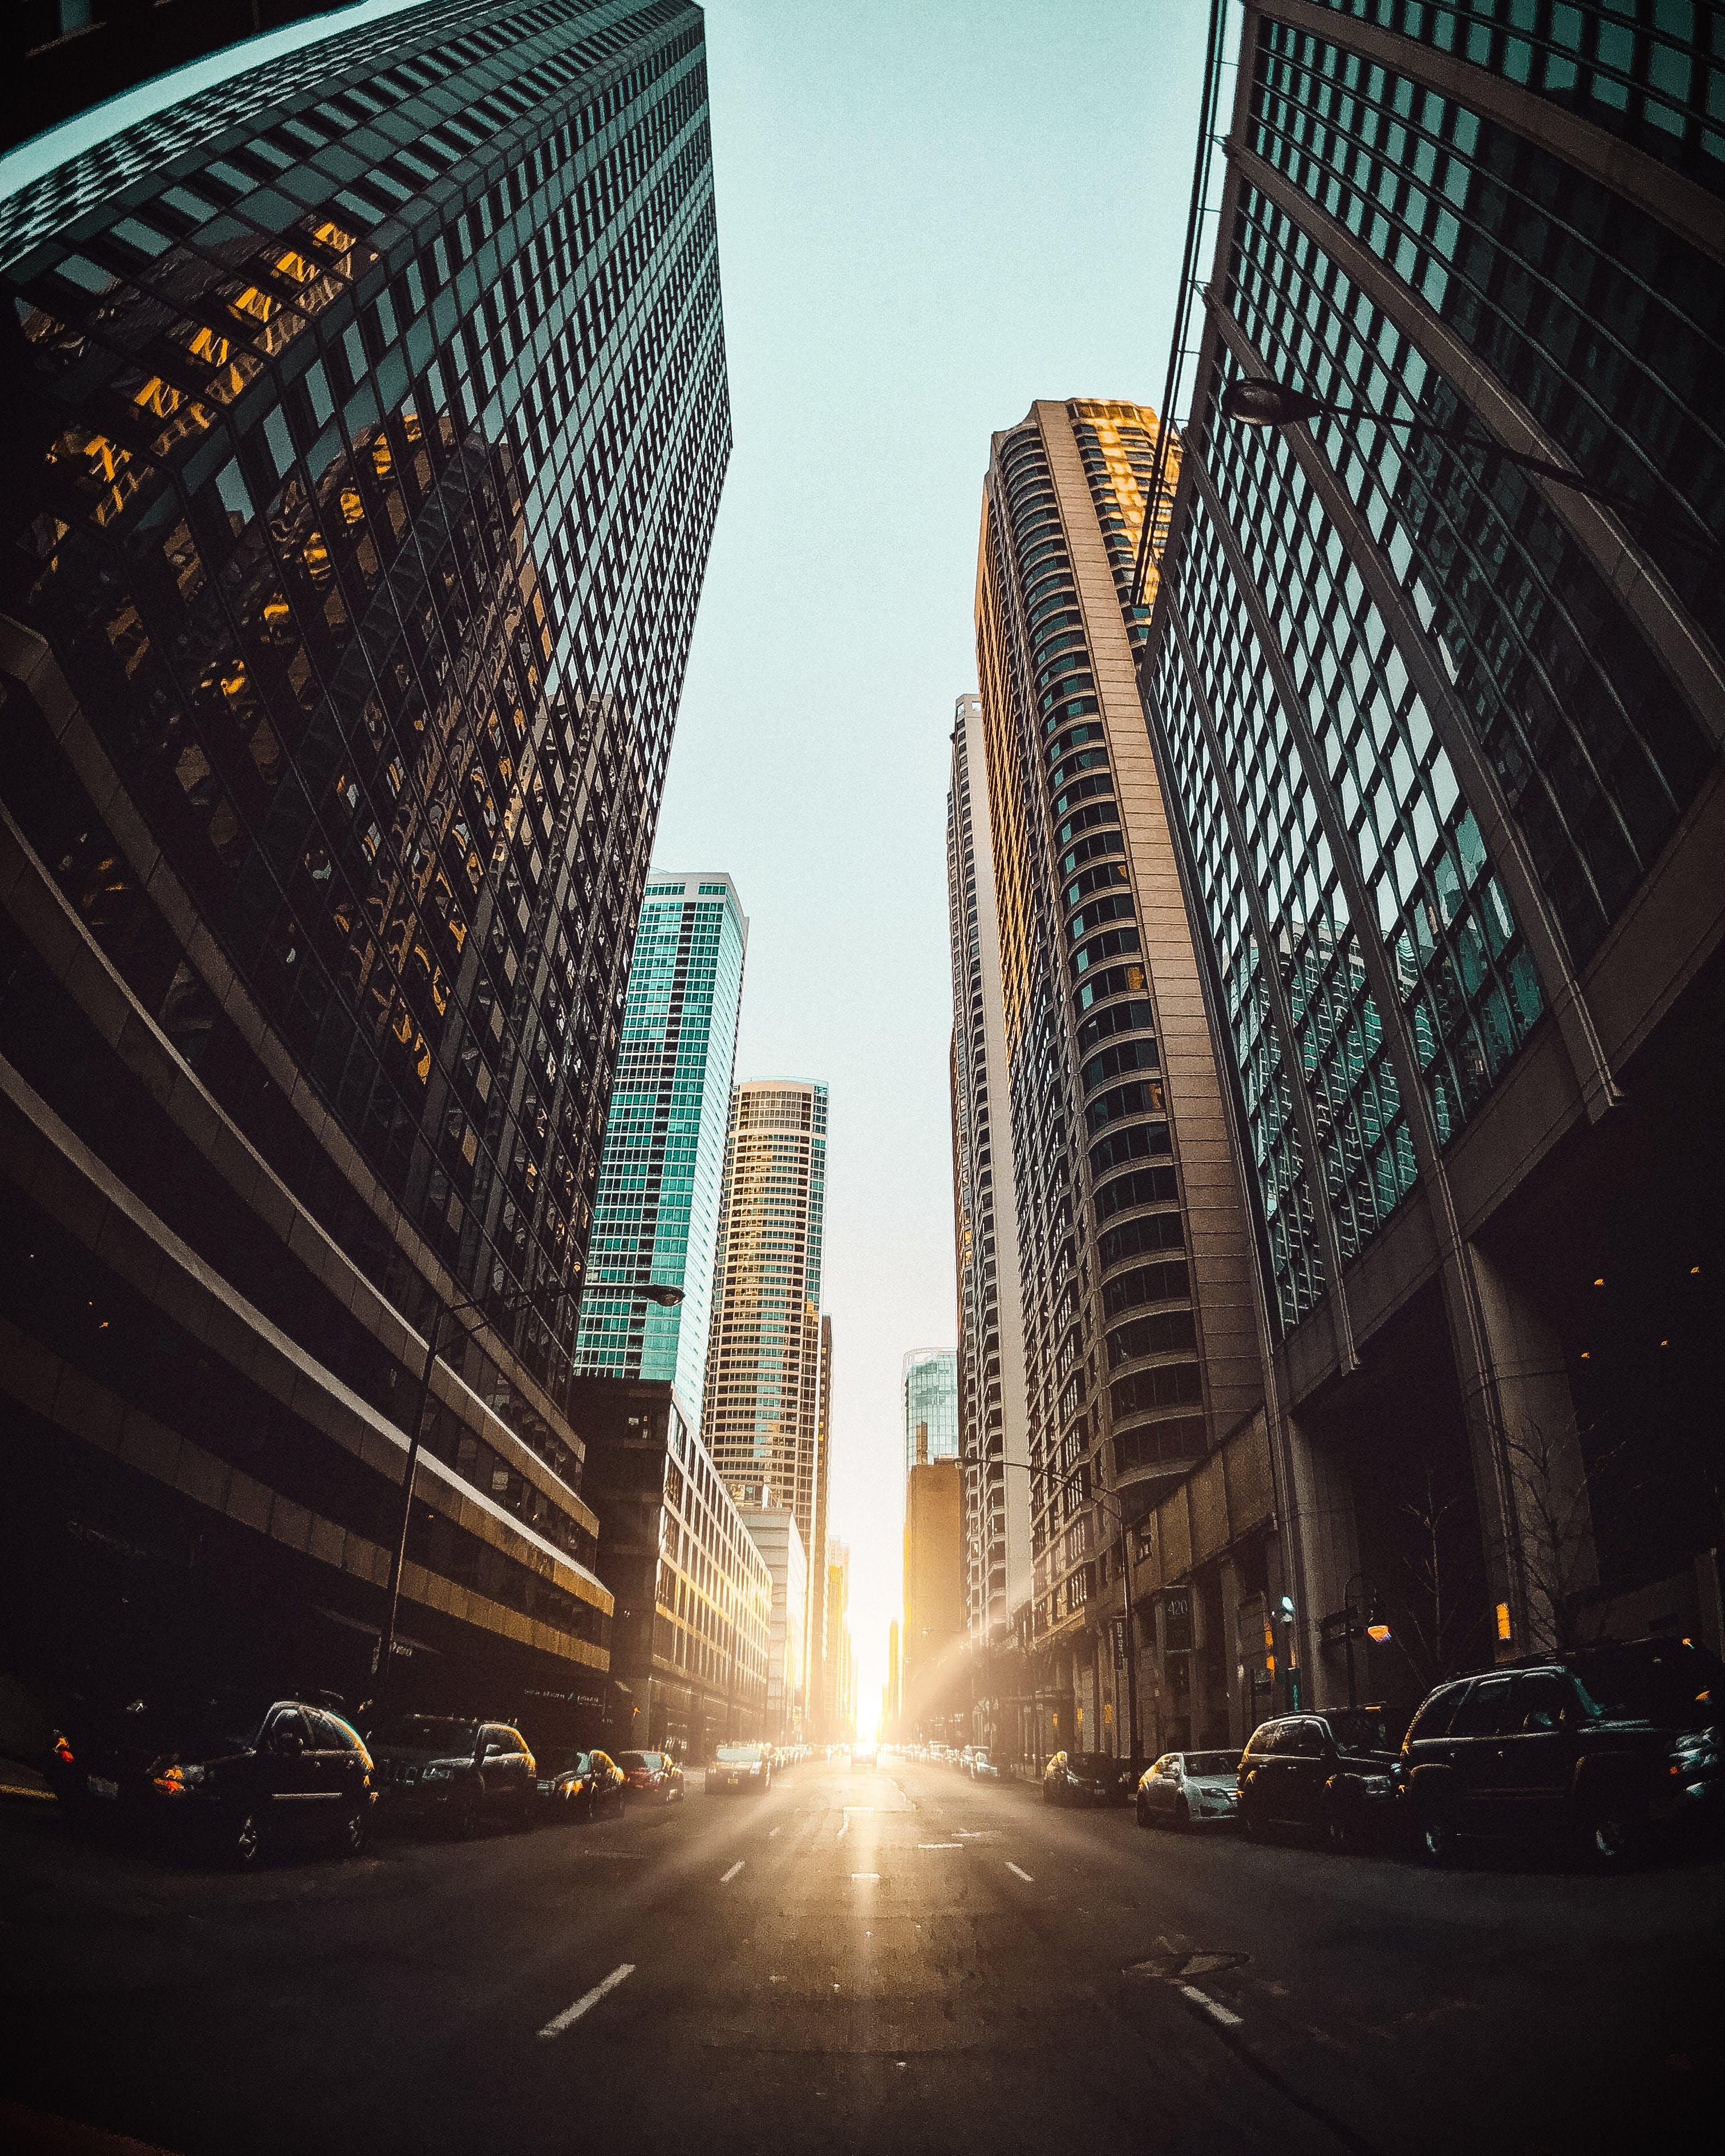 Cars Between High Rise Buildings